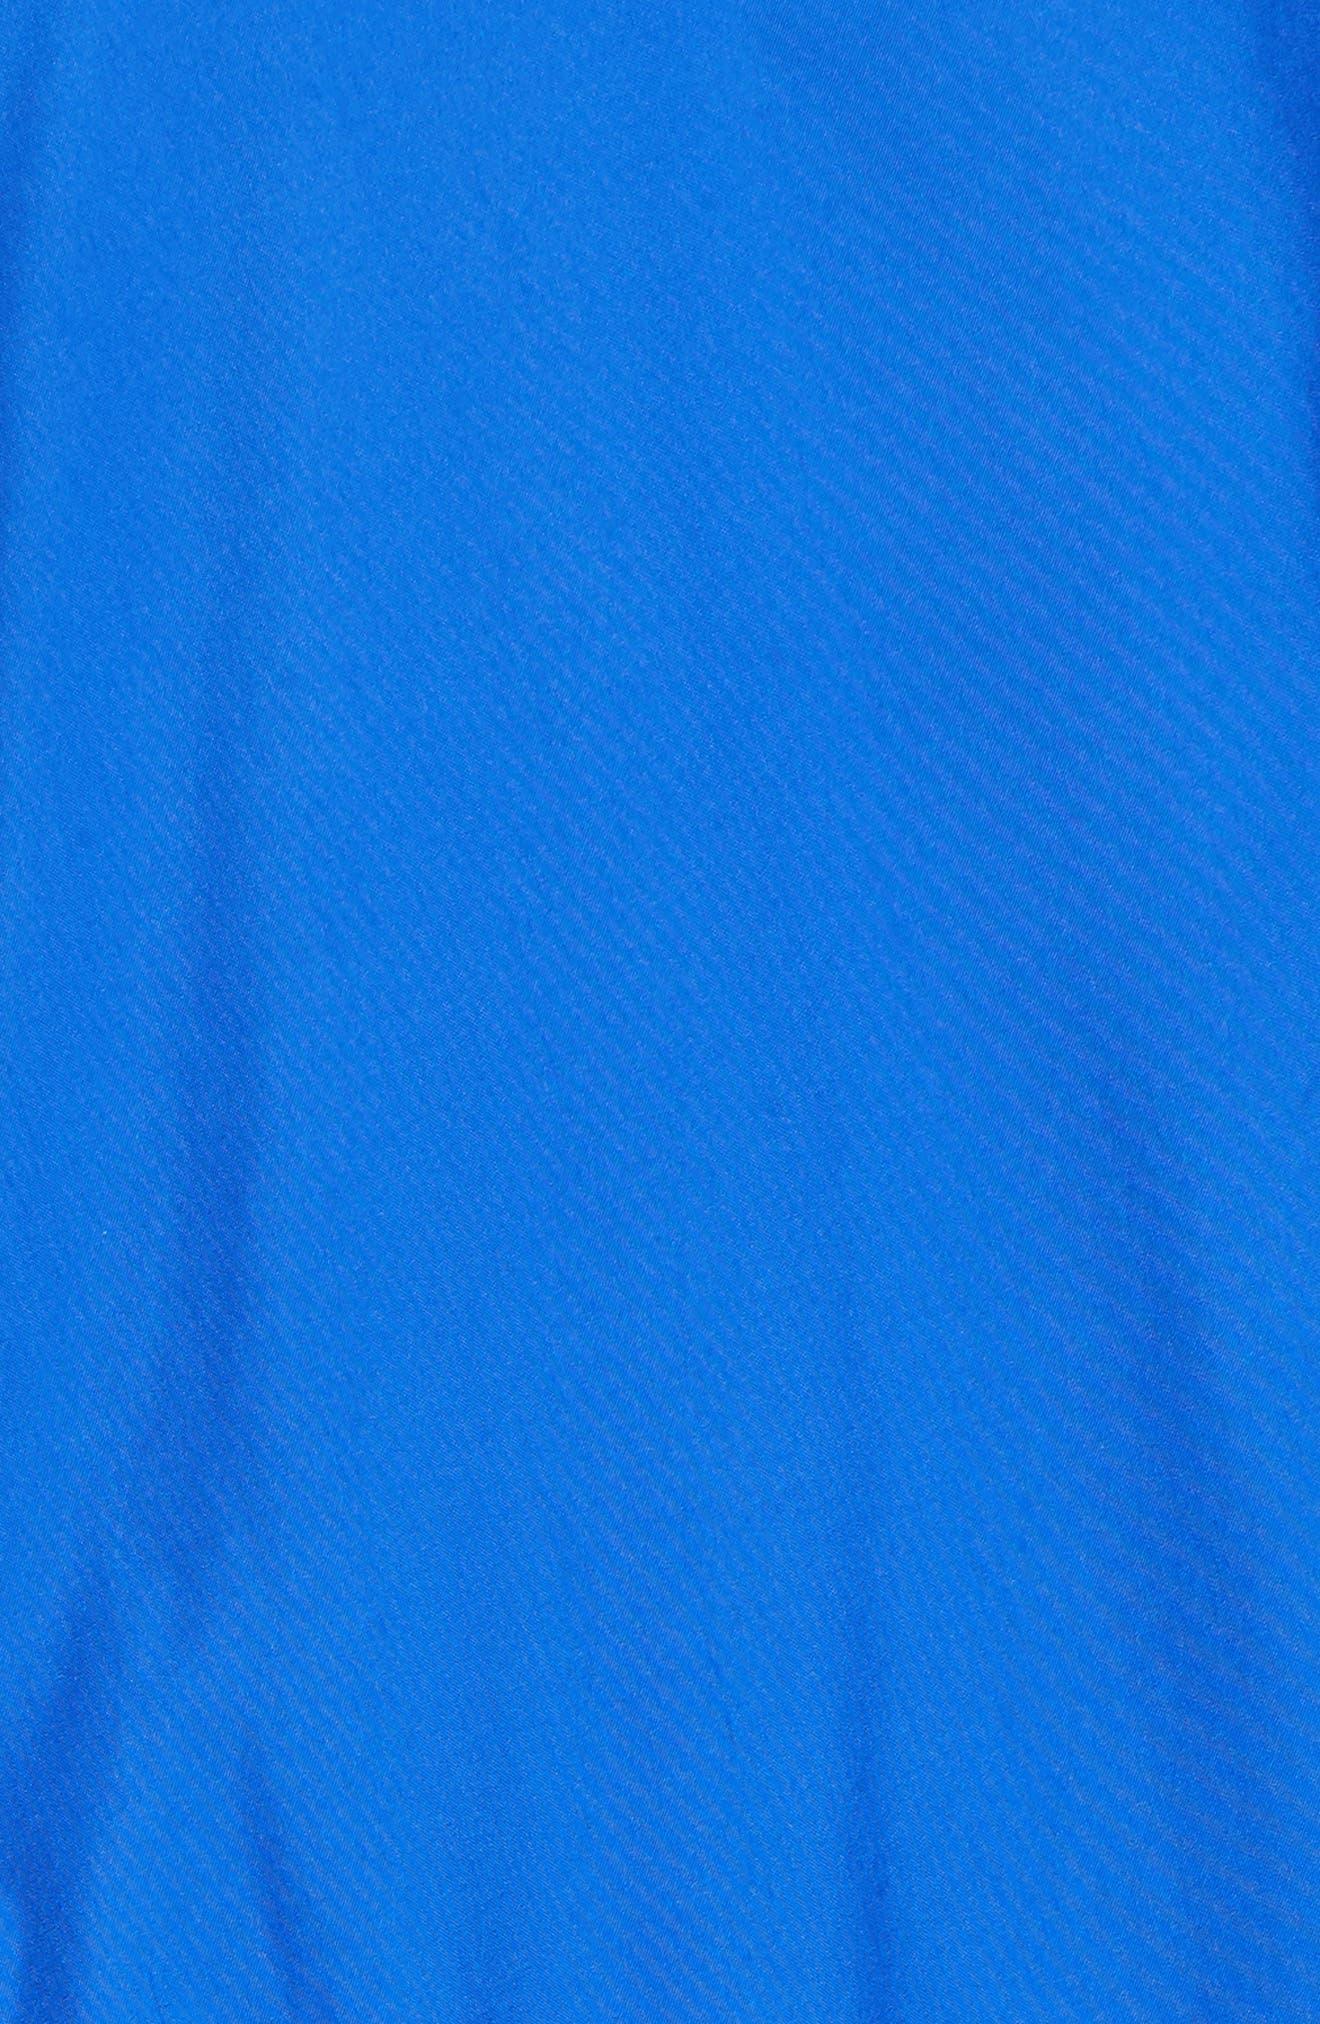 SB Shield Coach's Jacket,                             Alternate thumbnail 7, color,                             HYPER ROYAL/ WHITE